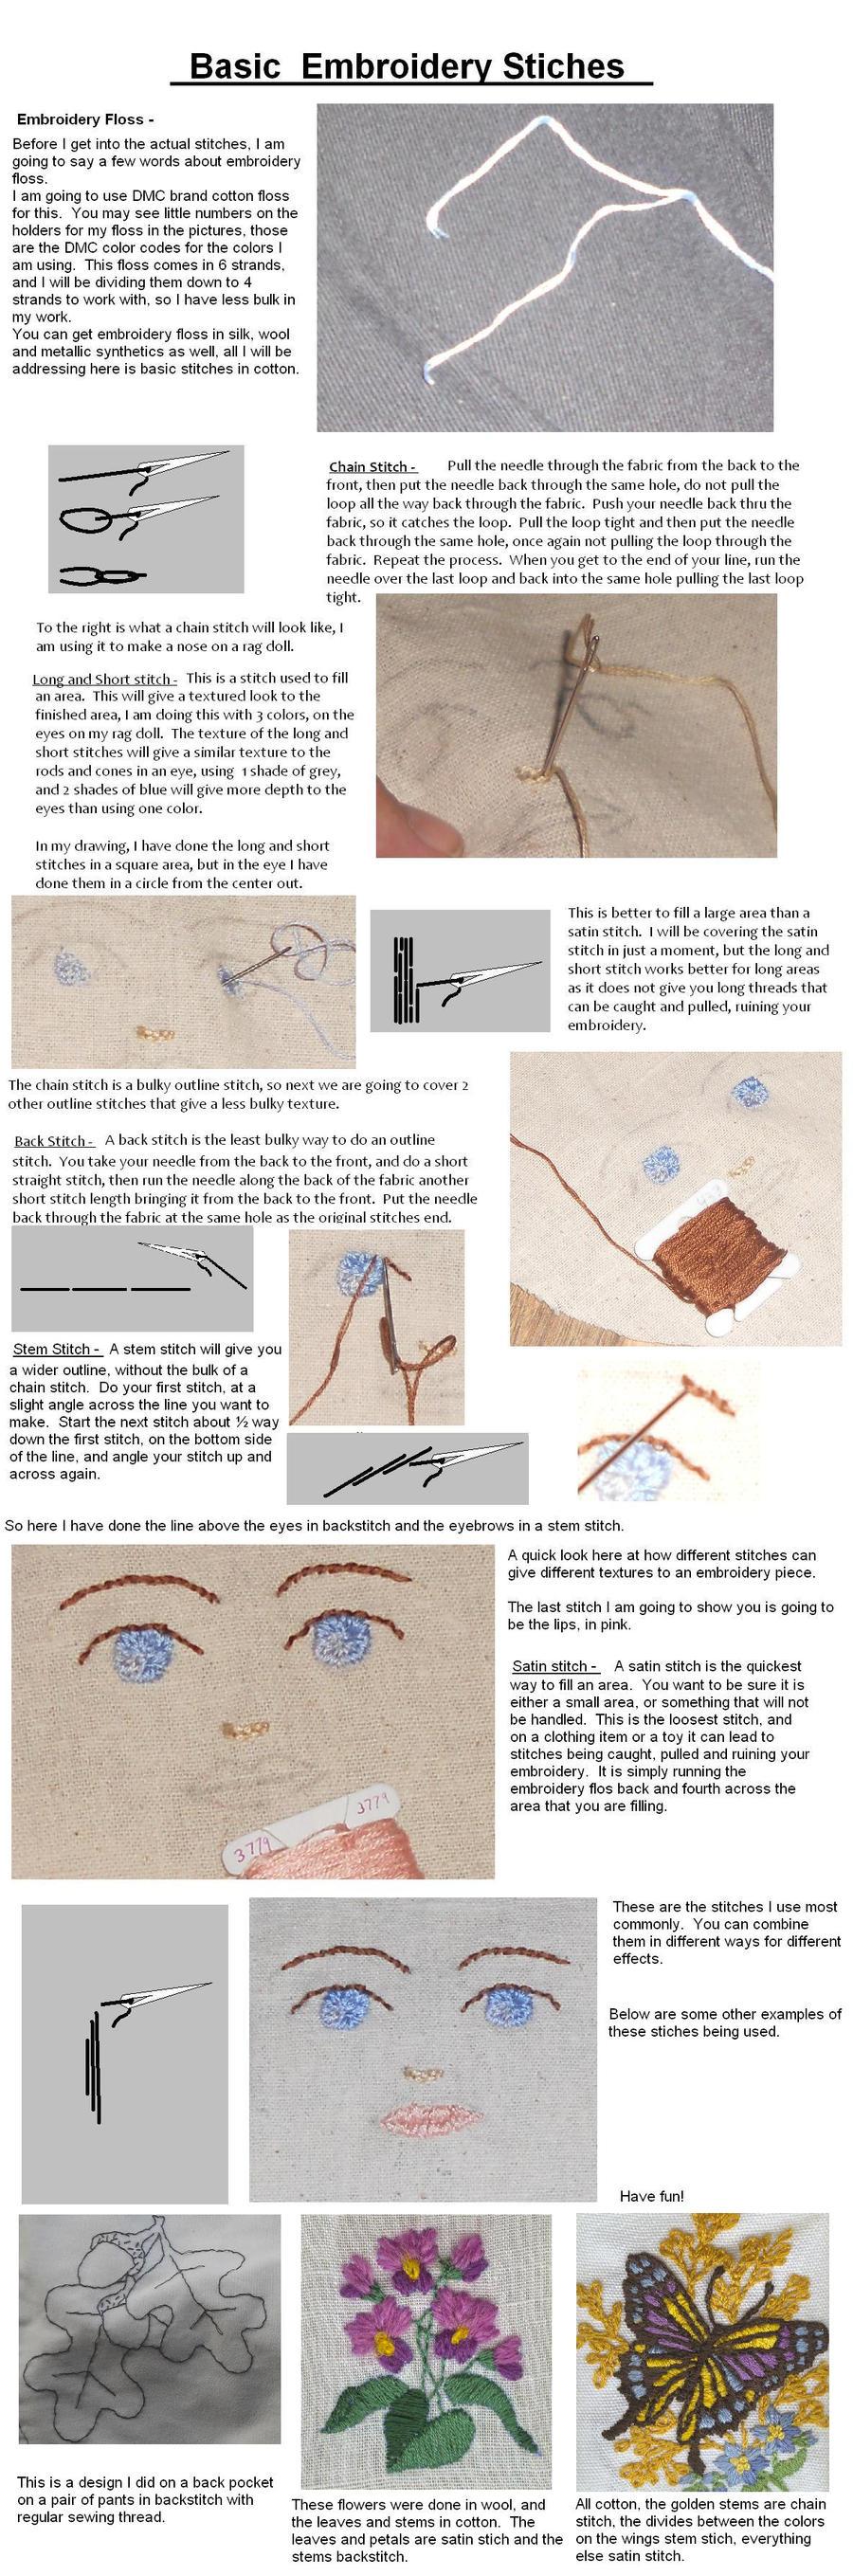 Embroidery stitches by Glori305